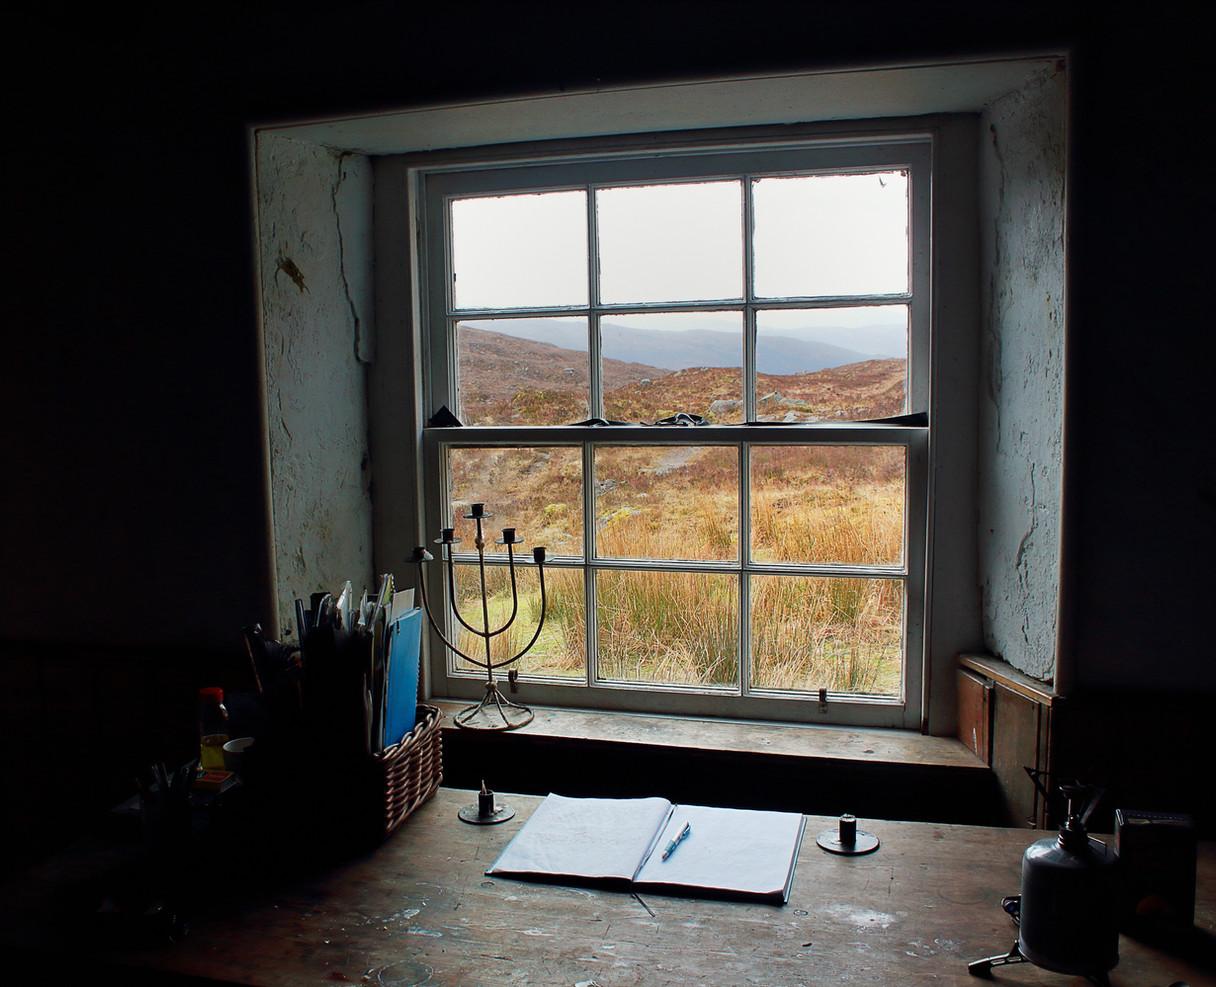 Window at Coire Fionnaraich Bothy, North West Highlands